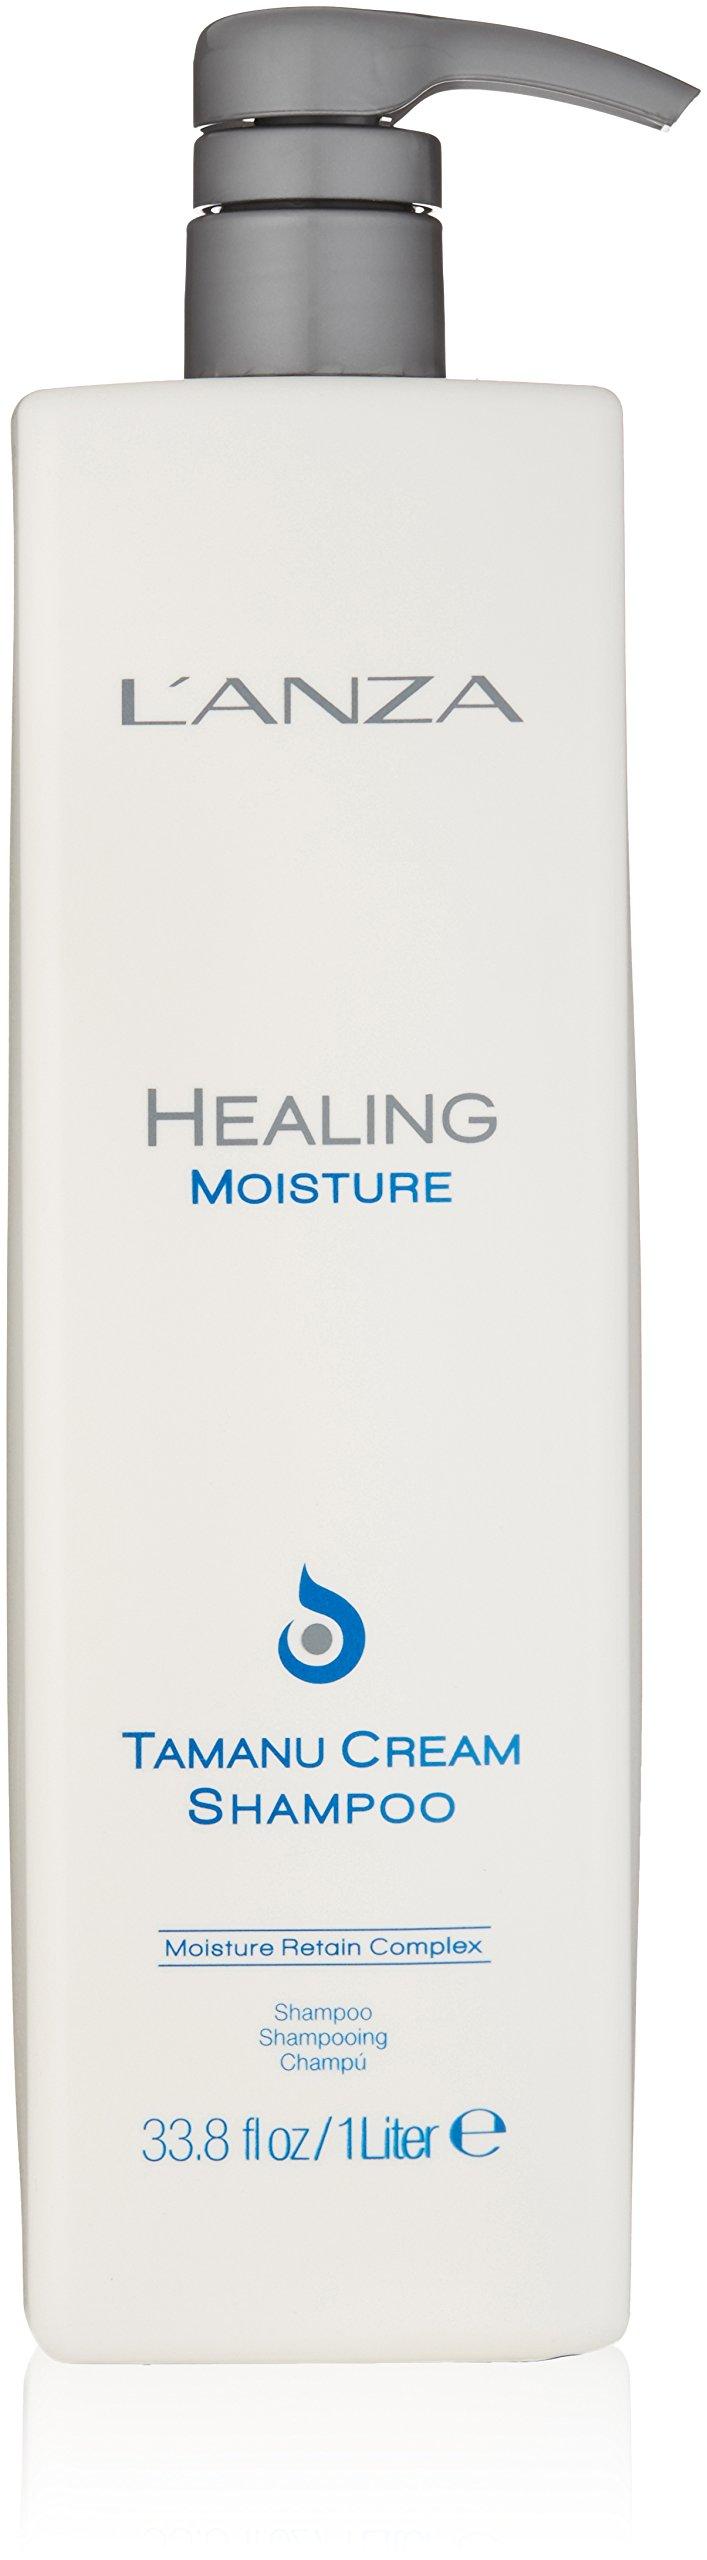 Lanza Healing Moisture Tamanu Cream Shampoo 33.8 oz